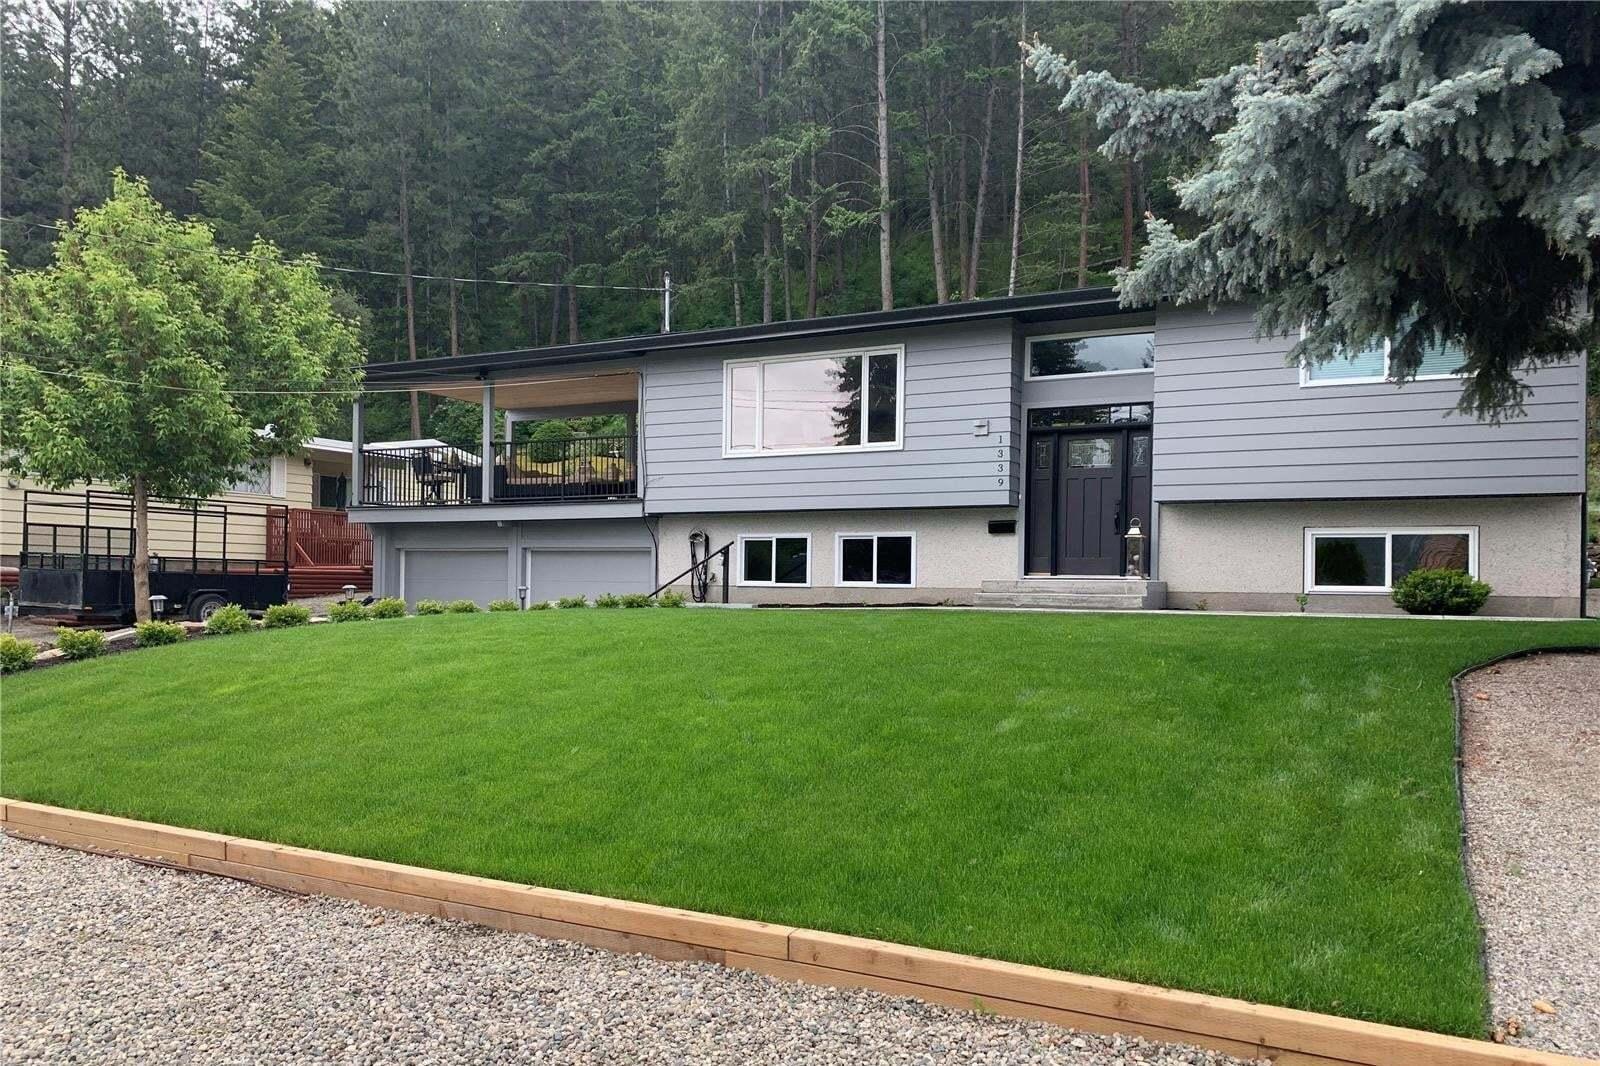 House for sale at 1339 Ponderosa Rd West Kelowna British Columbia - MLS: 10204960